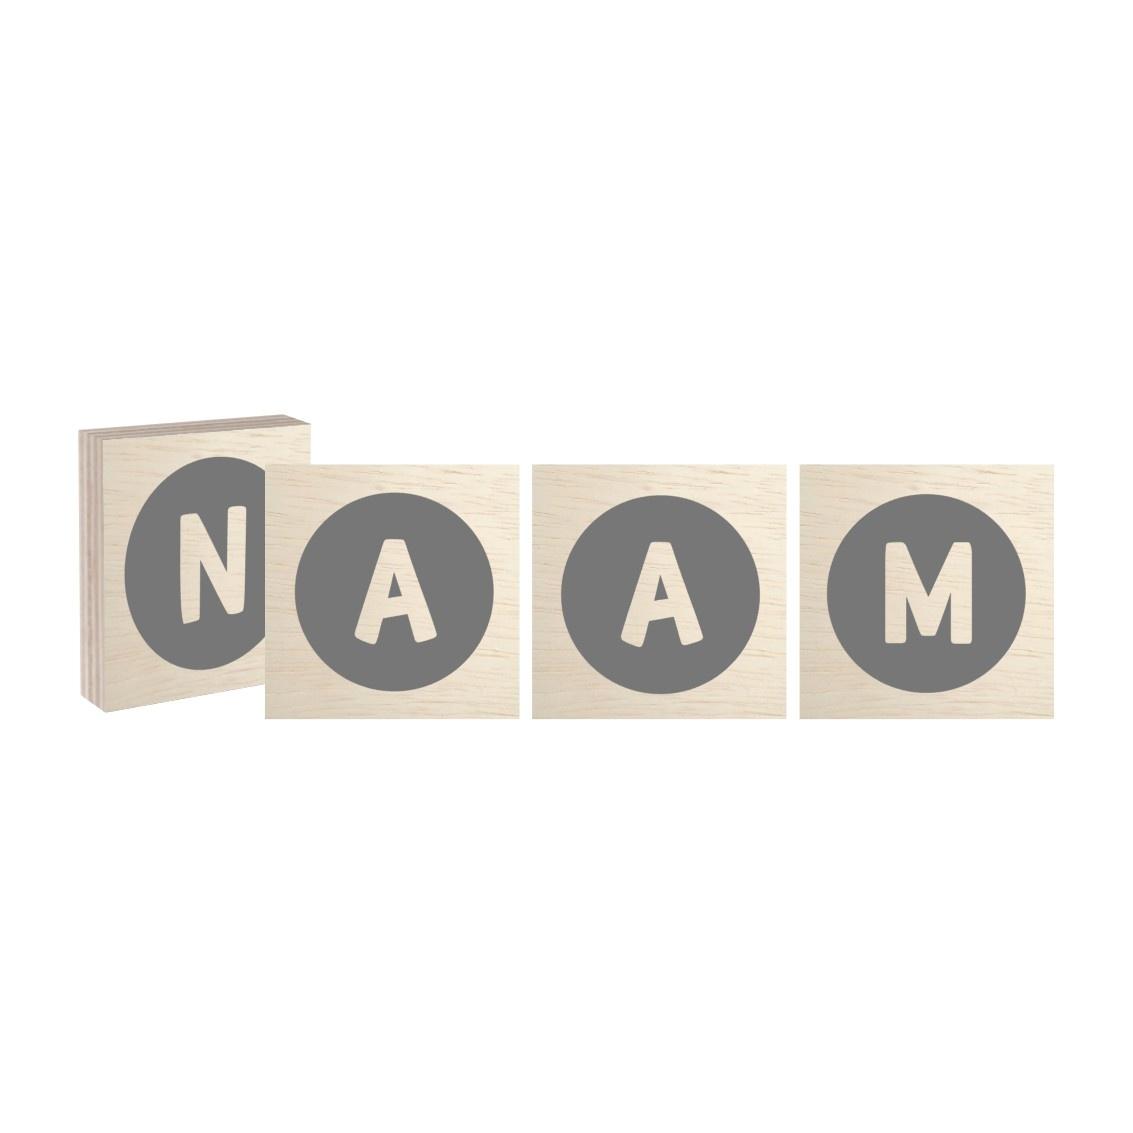 Naamblok Cirkel